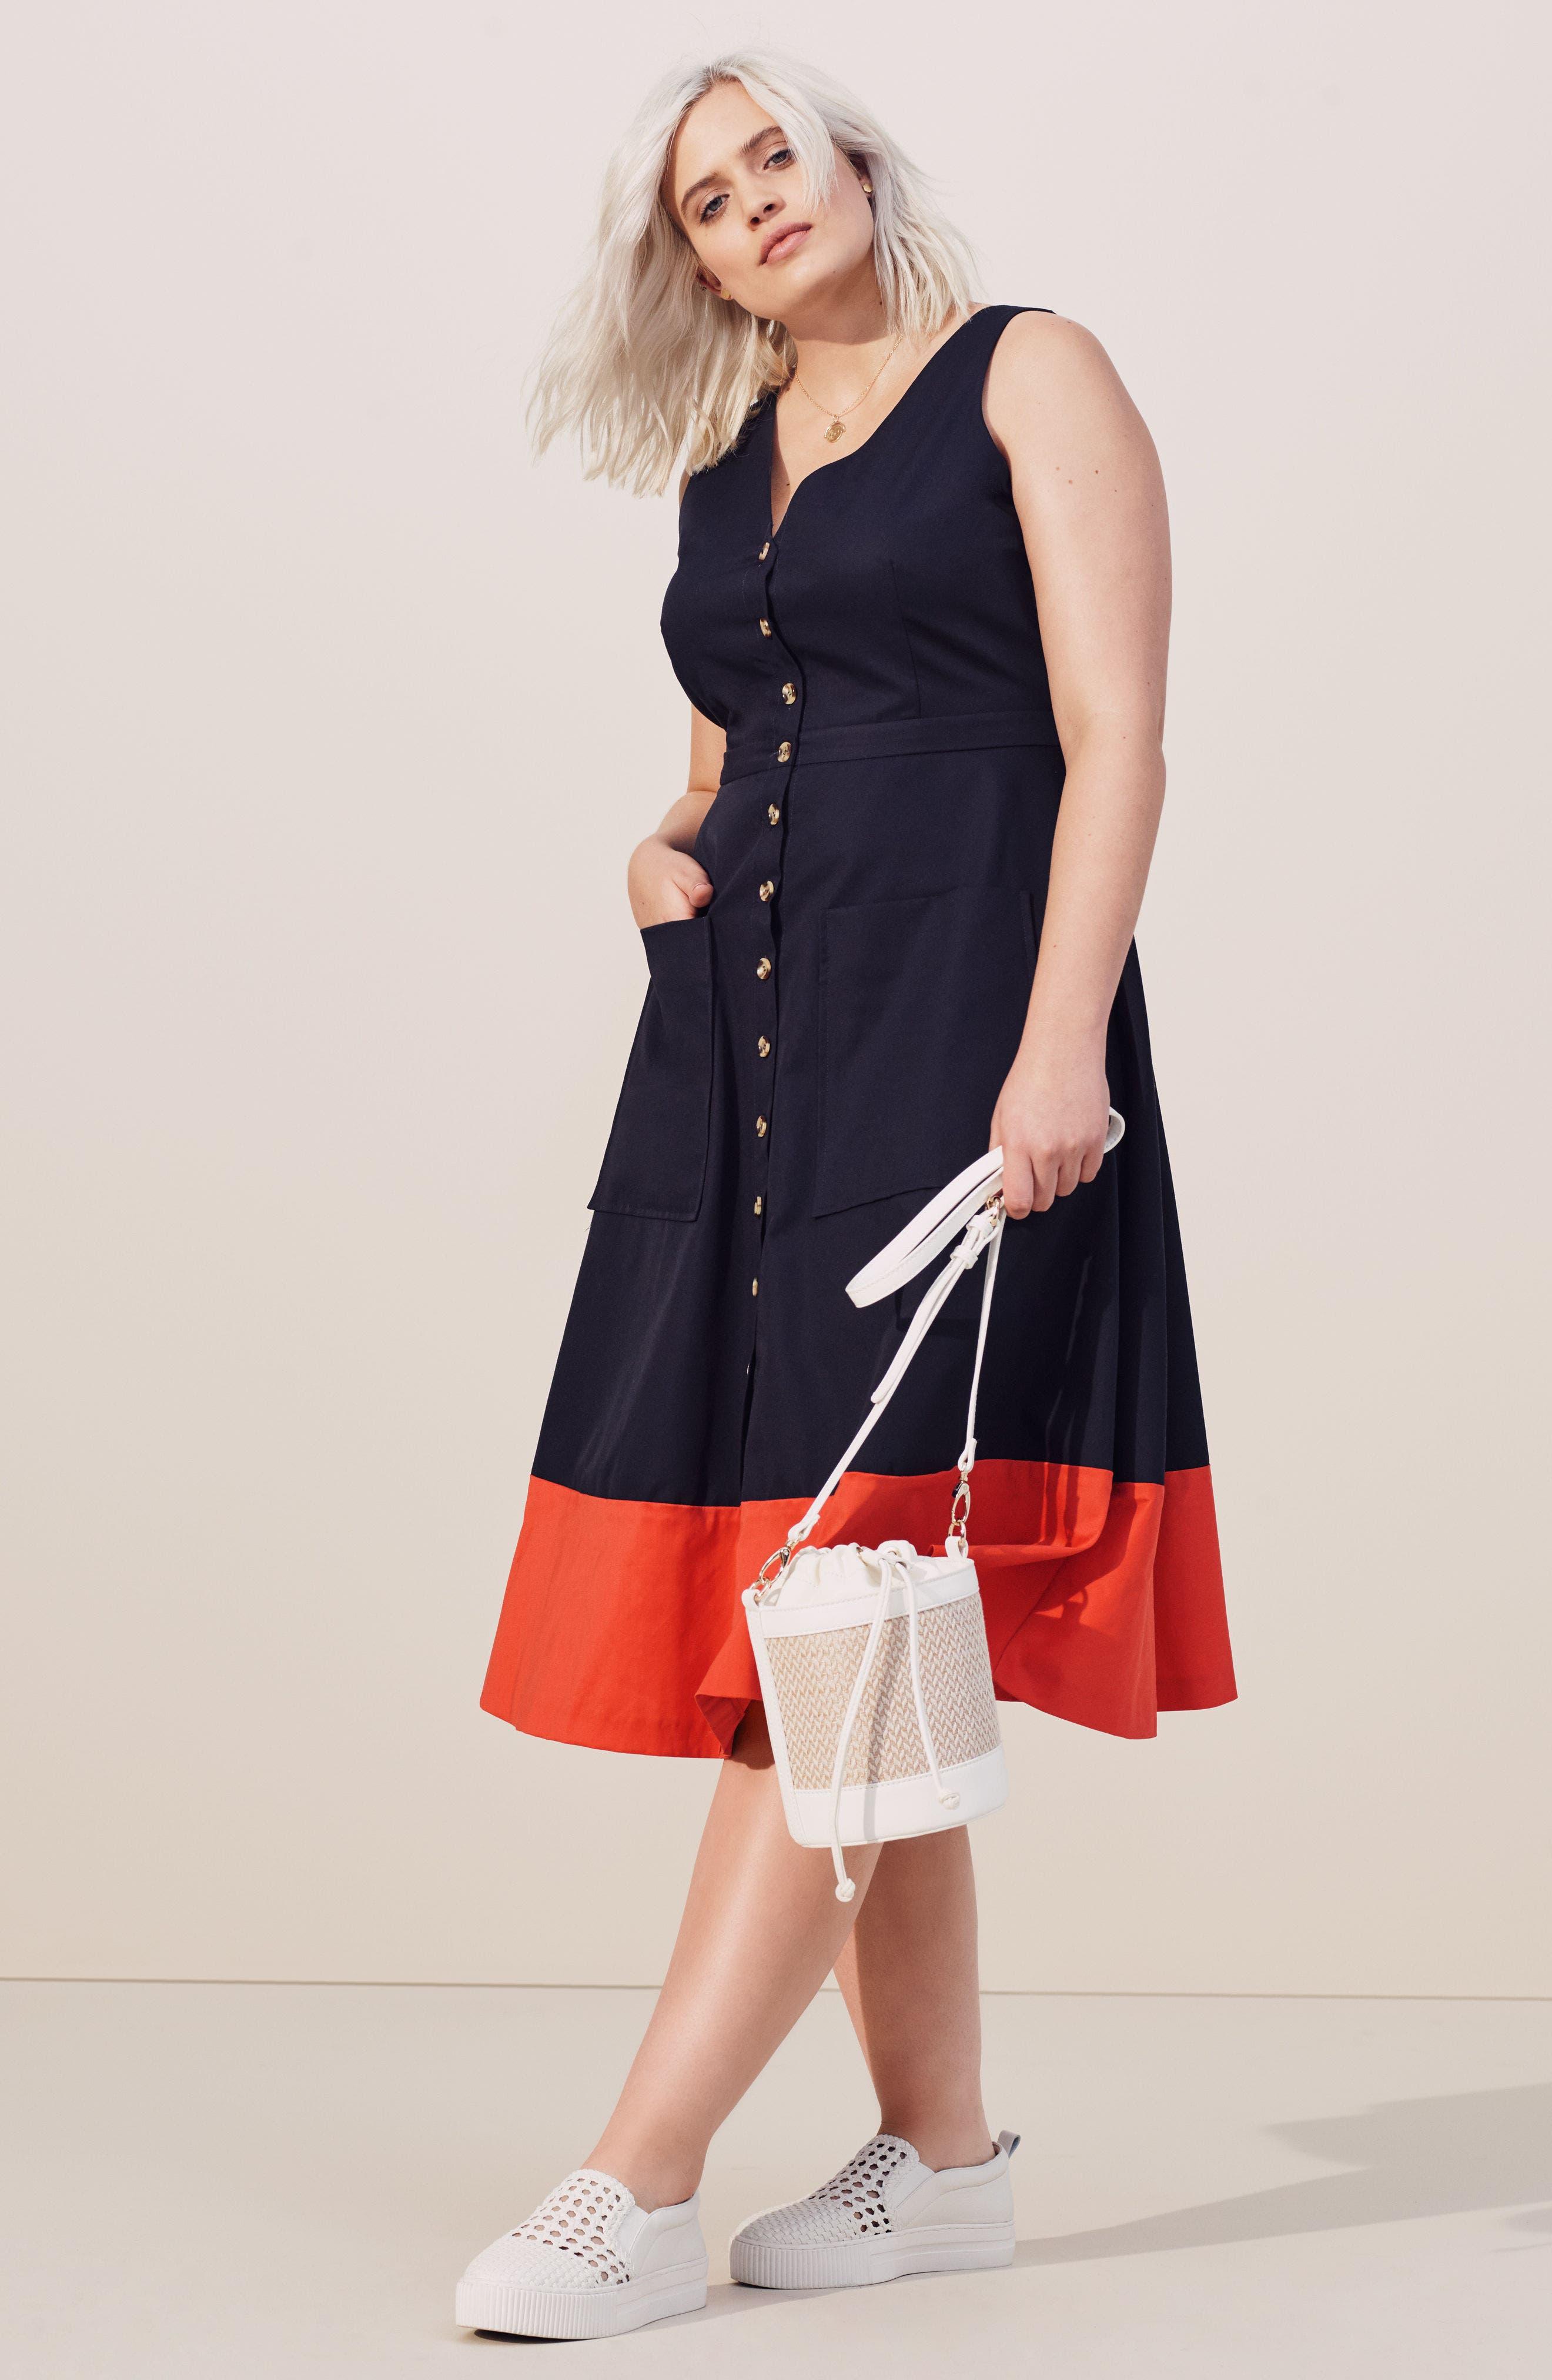 Colorblock Cotton Midi Dress,                             Alternate thumbnail 8, color,                             NAVY RED COLOR BLOCK